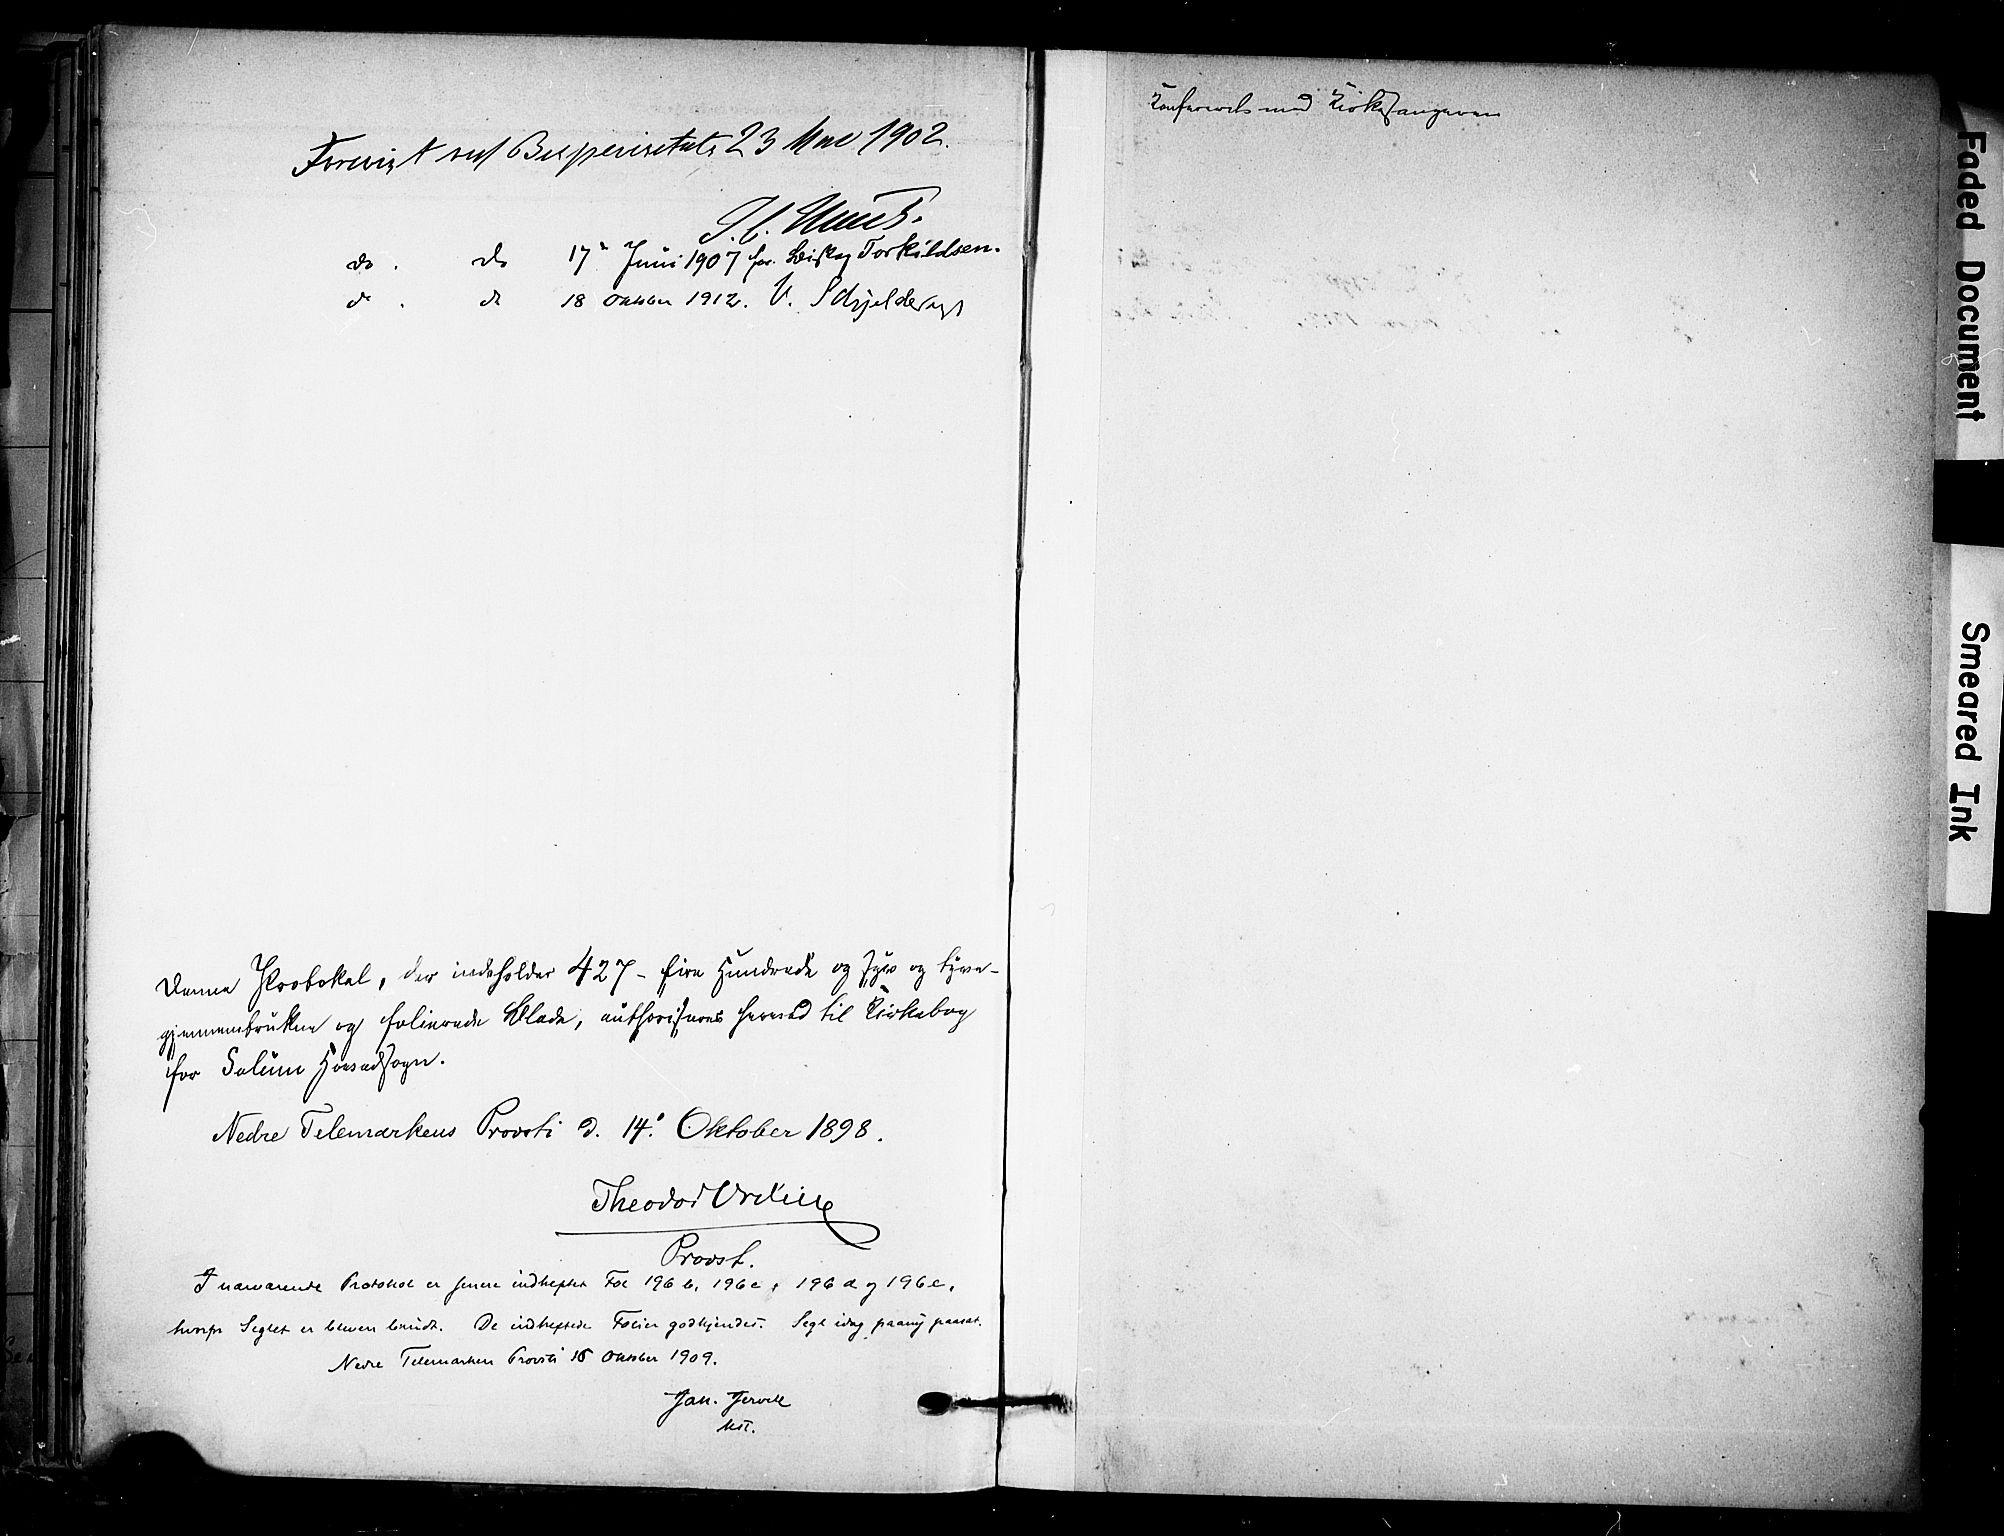 SAKO, Solum kirkebøker, F/Fa/L0011: Ministerialbok nr. I 11, 1898-1909